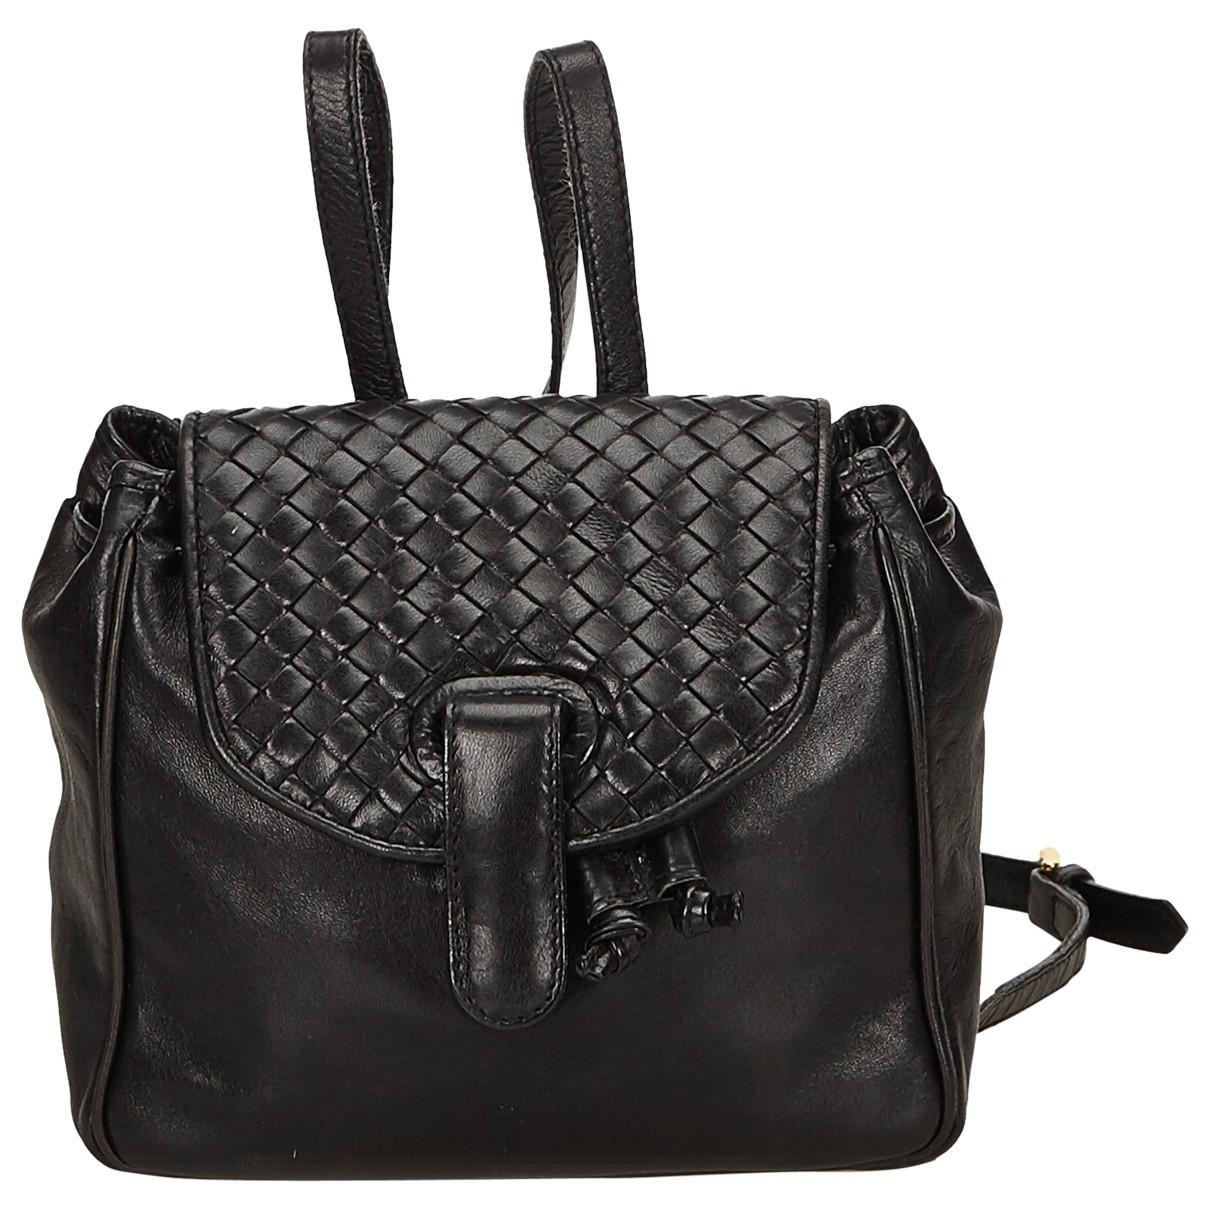 4946dfab23b5 Bottega Veneta Leather Backpack in Black - Lyst